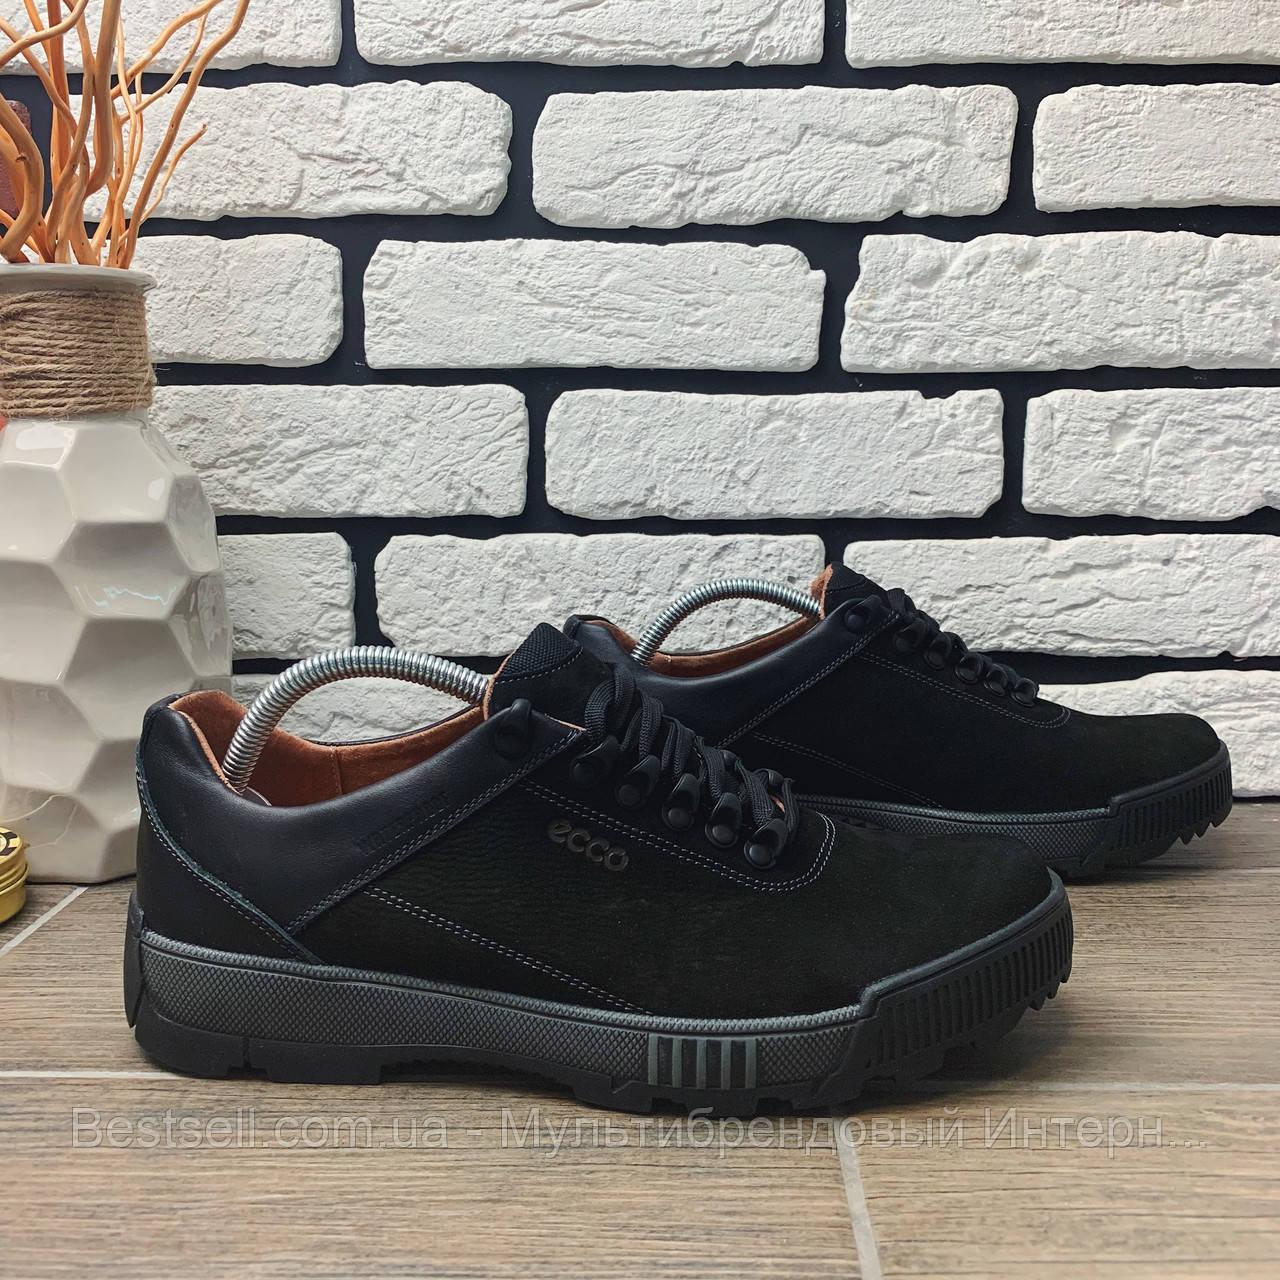 Кросівки ECCO 13005 ⏩ [ 41,43 ]